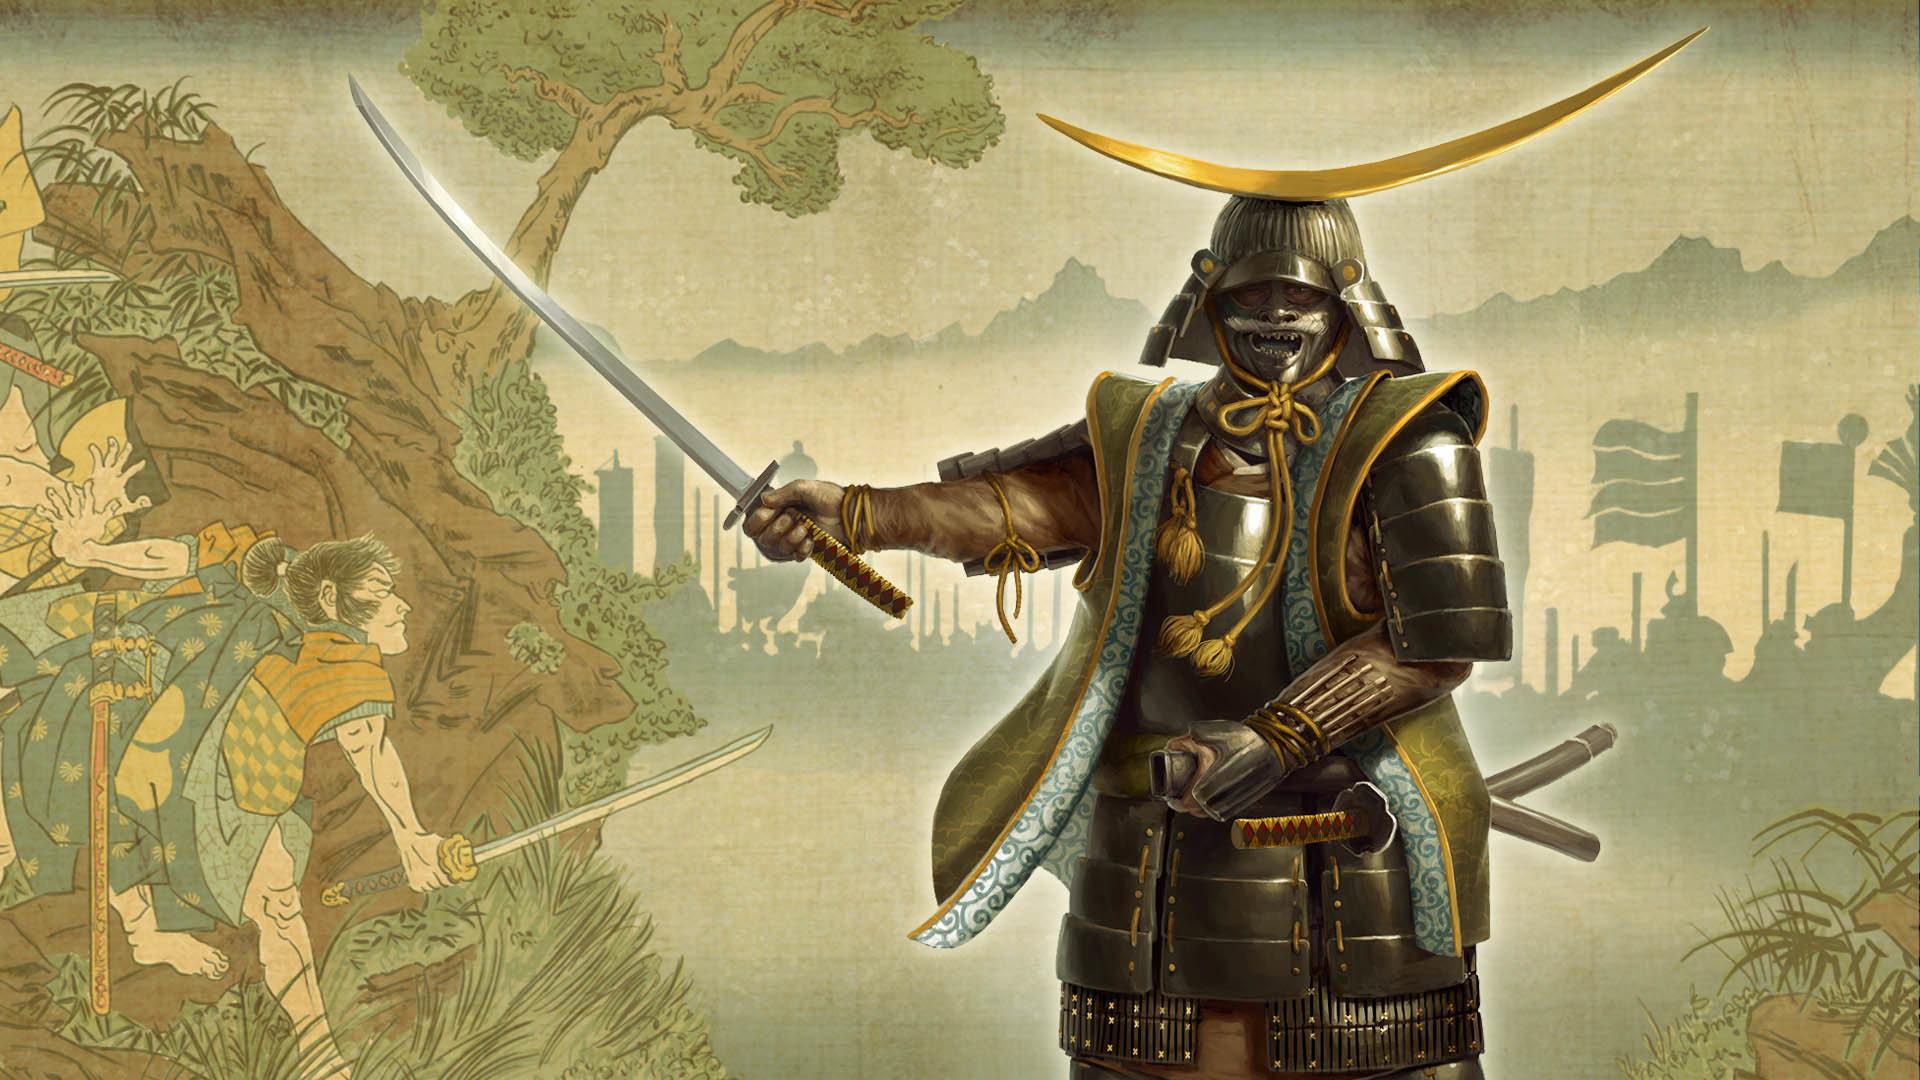 Total War Shogun 2 Wallpapers Hd For Desktop Backgrounds